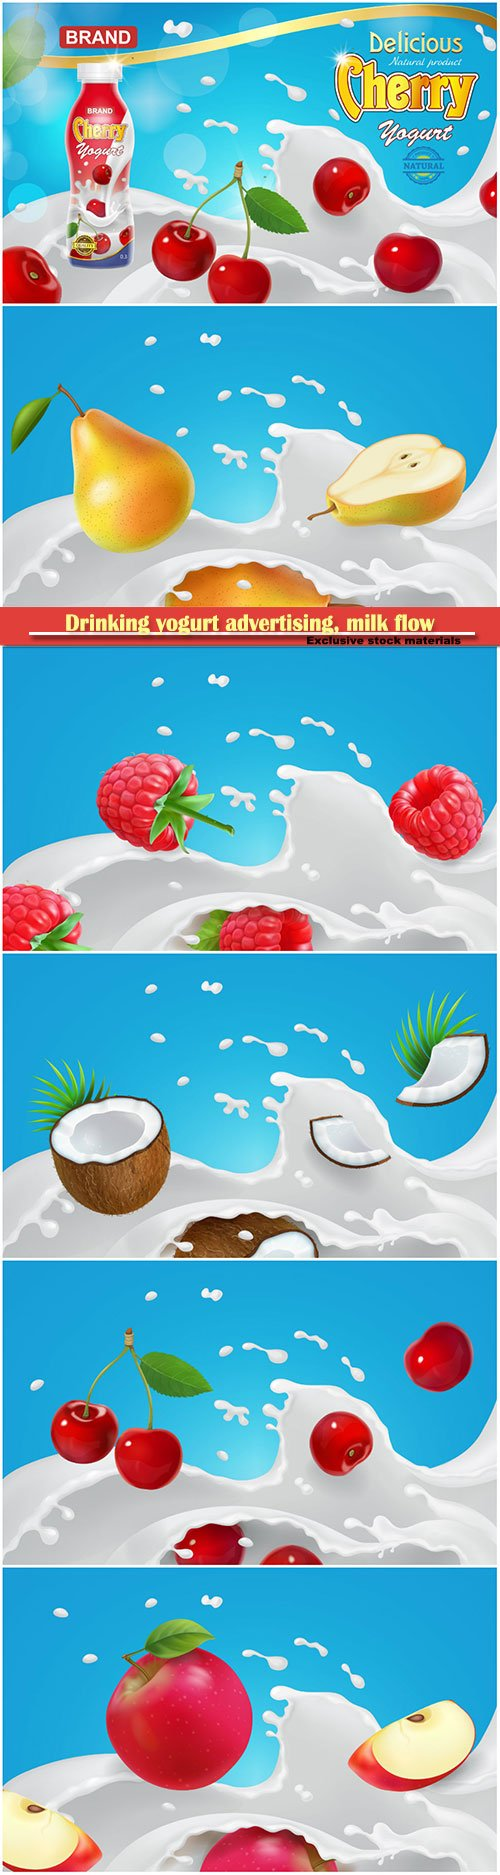 Drinking yogurt advertising,  milk flow and fruits and berries